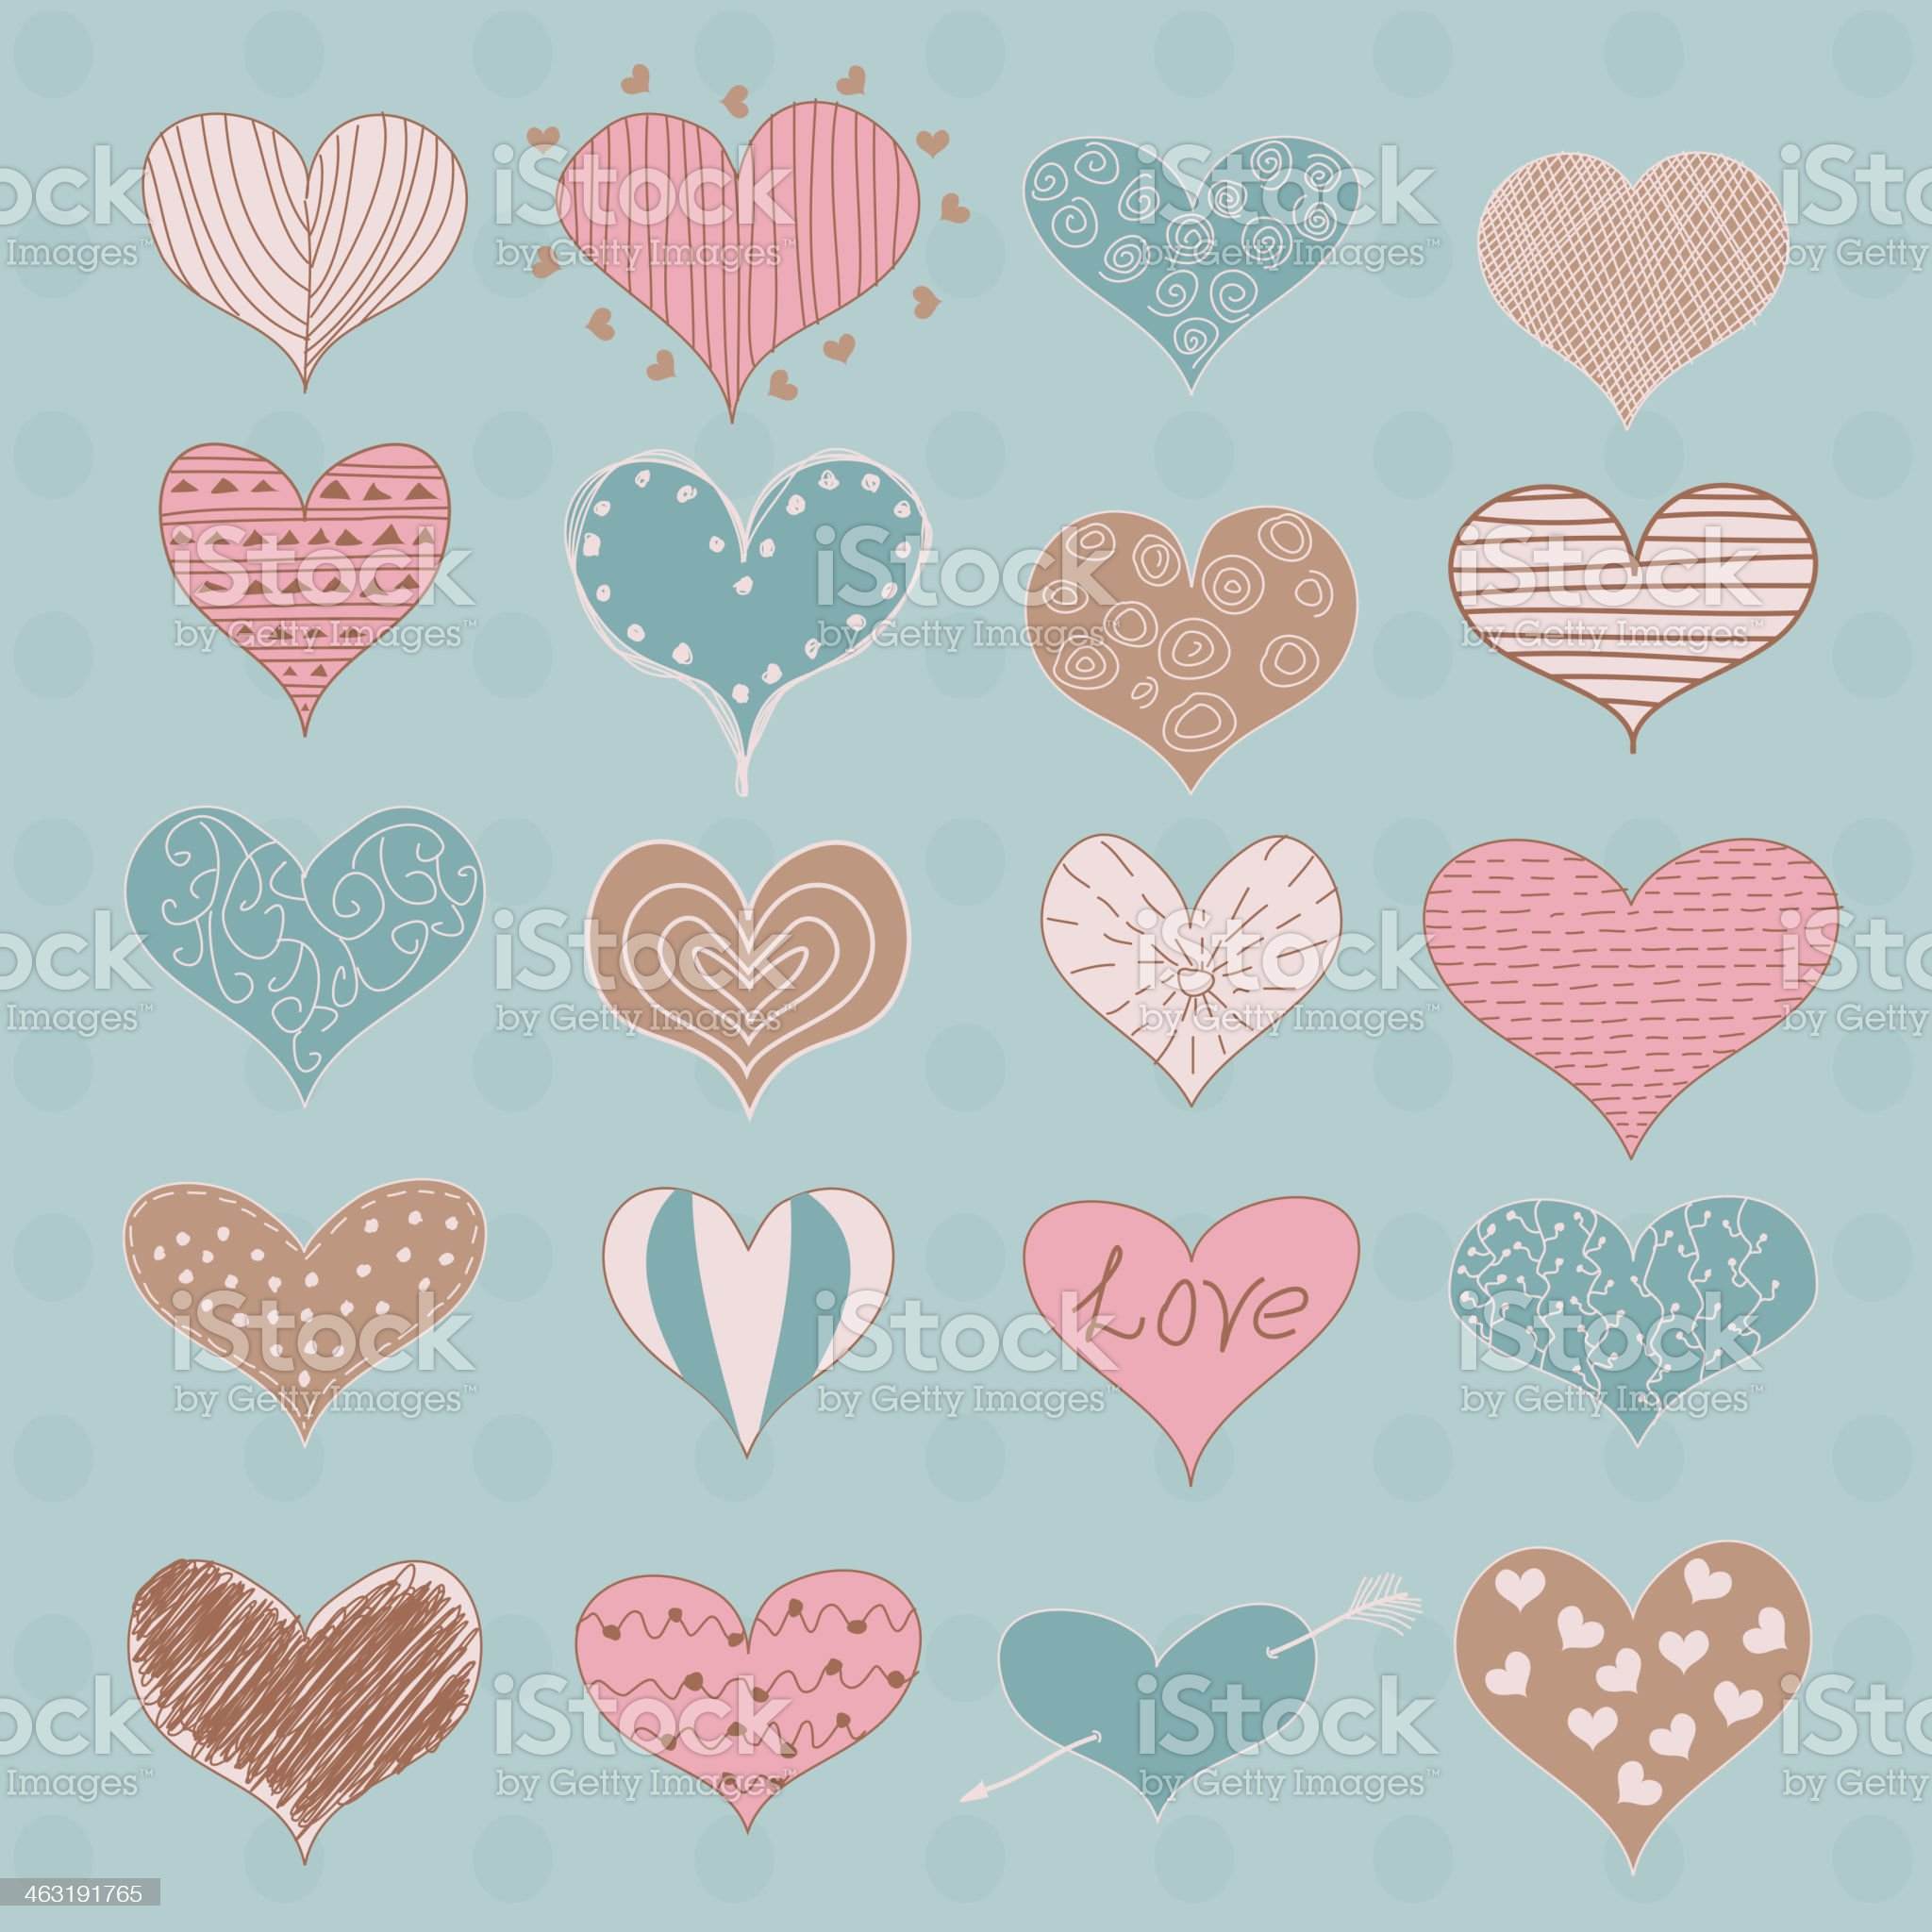 Valentine's Day Hearts  Retro Sketchy Doodles vector royalty-free stock vector art